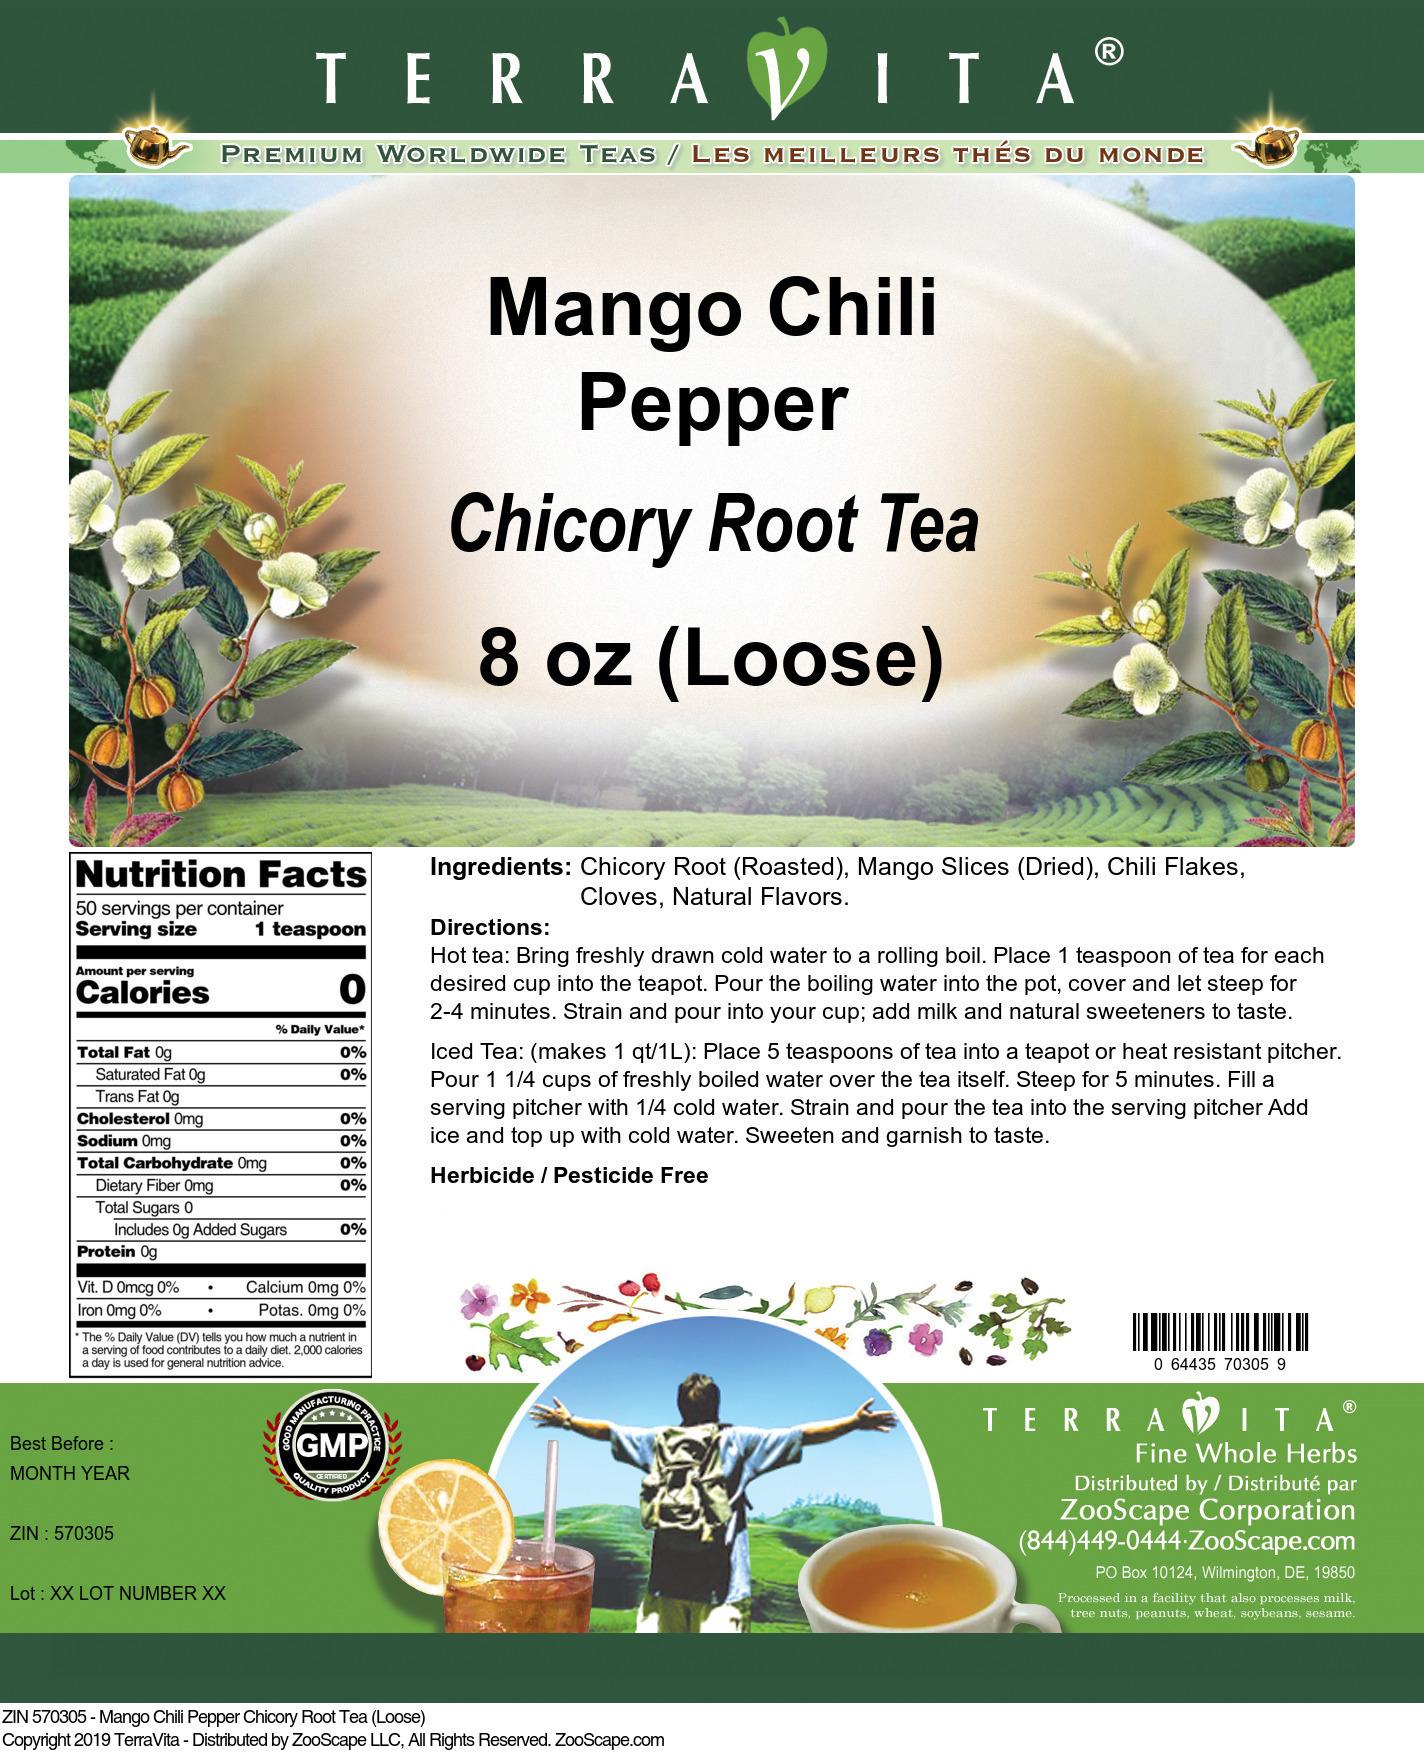 Mango Chili Pepper Chicory Root Tea (Loose)